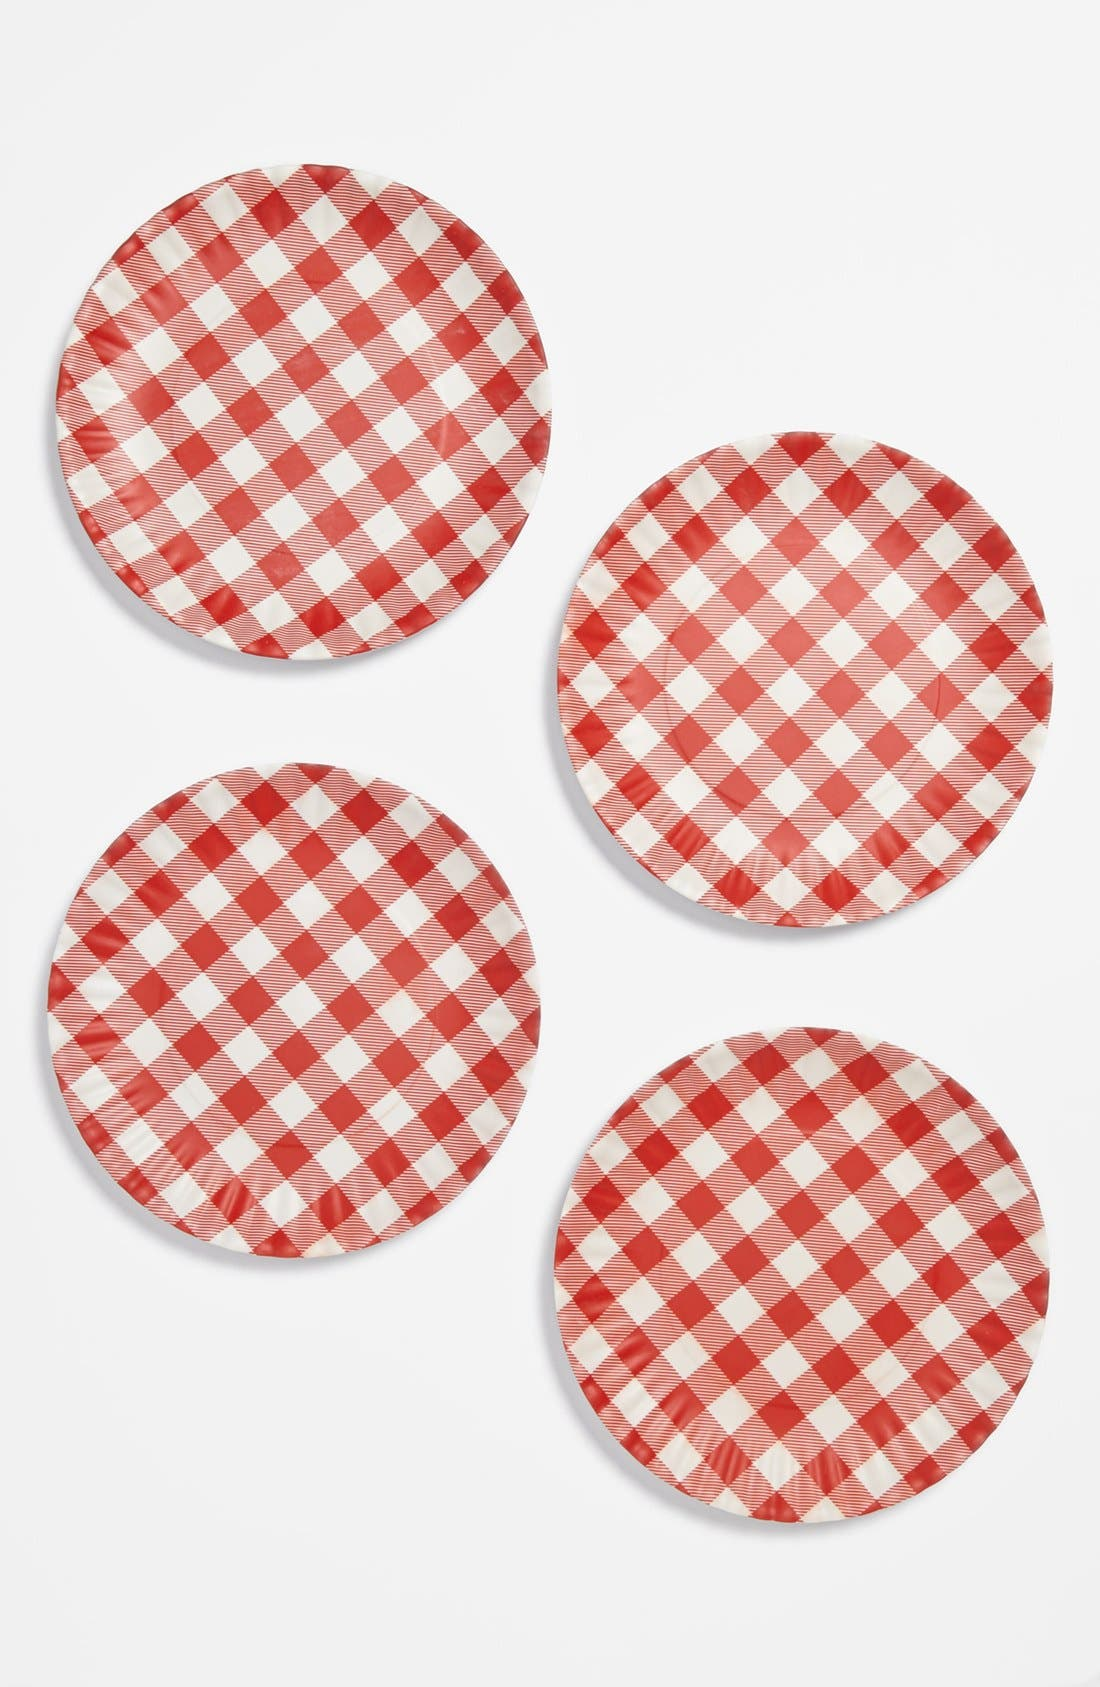 Alternate Image 1 Selected - Gingham Melamine Plates (Set of 4)